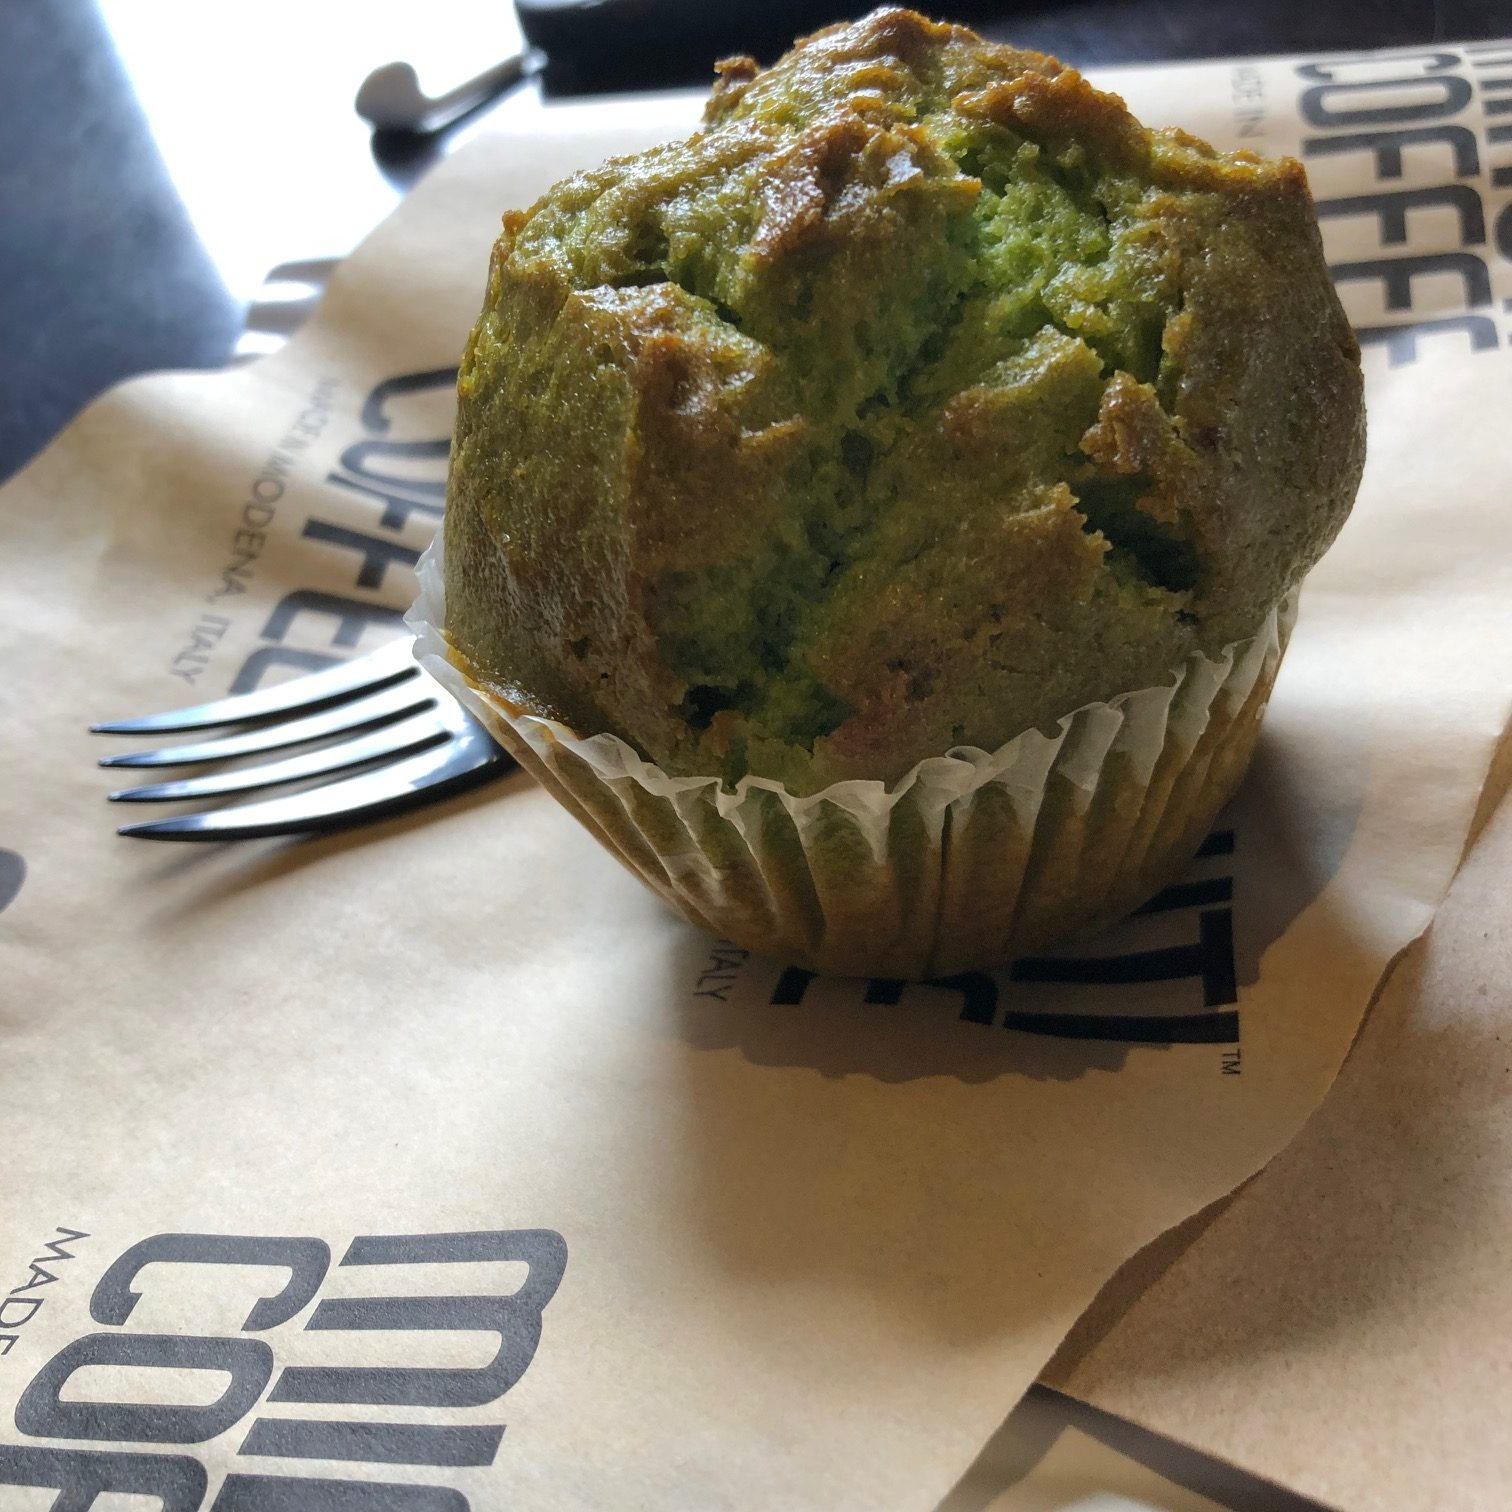 Pistachio Muffin at Minuti